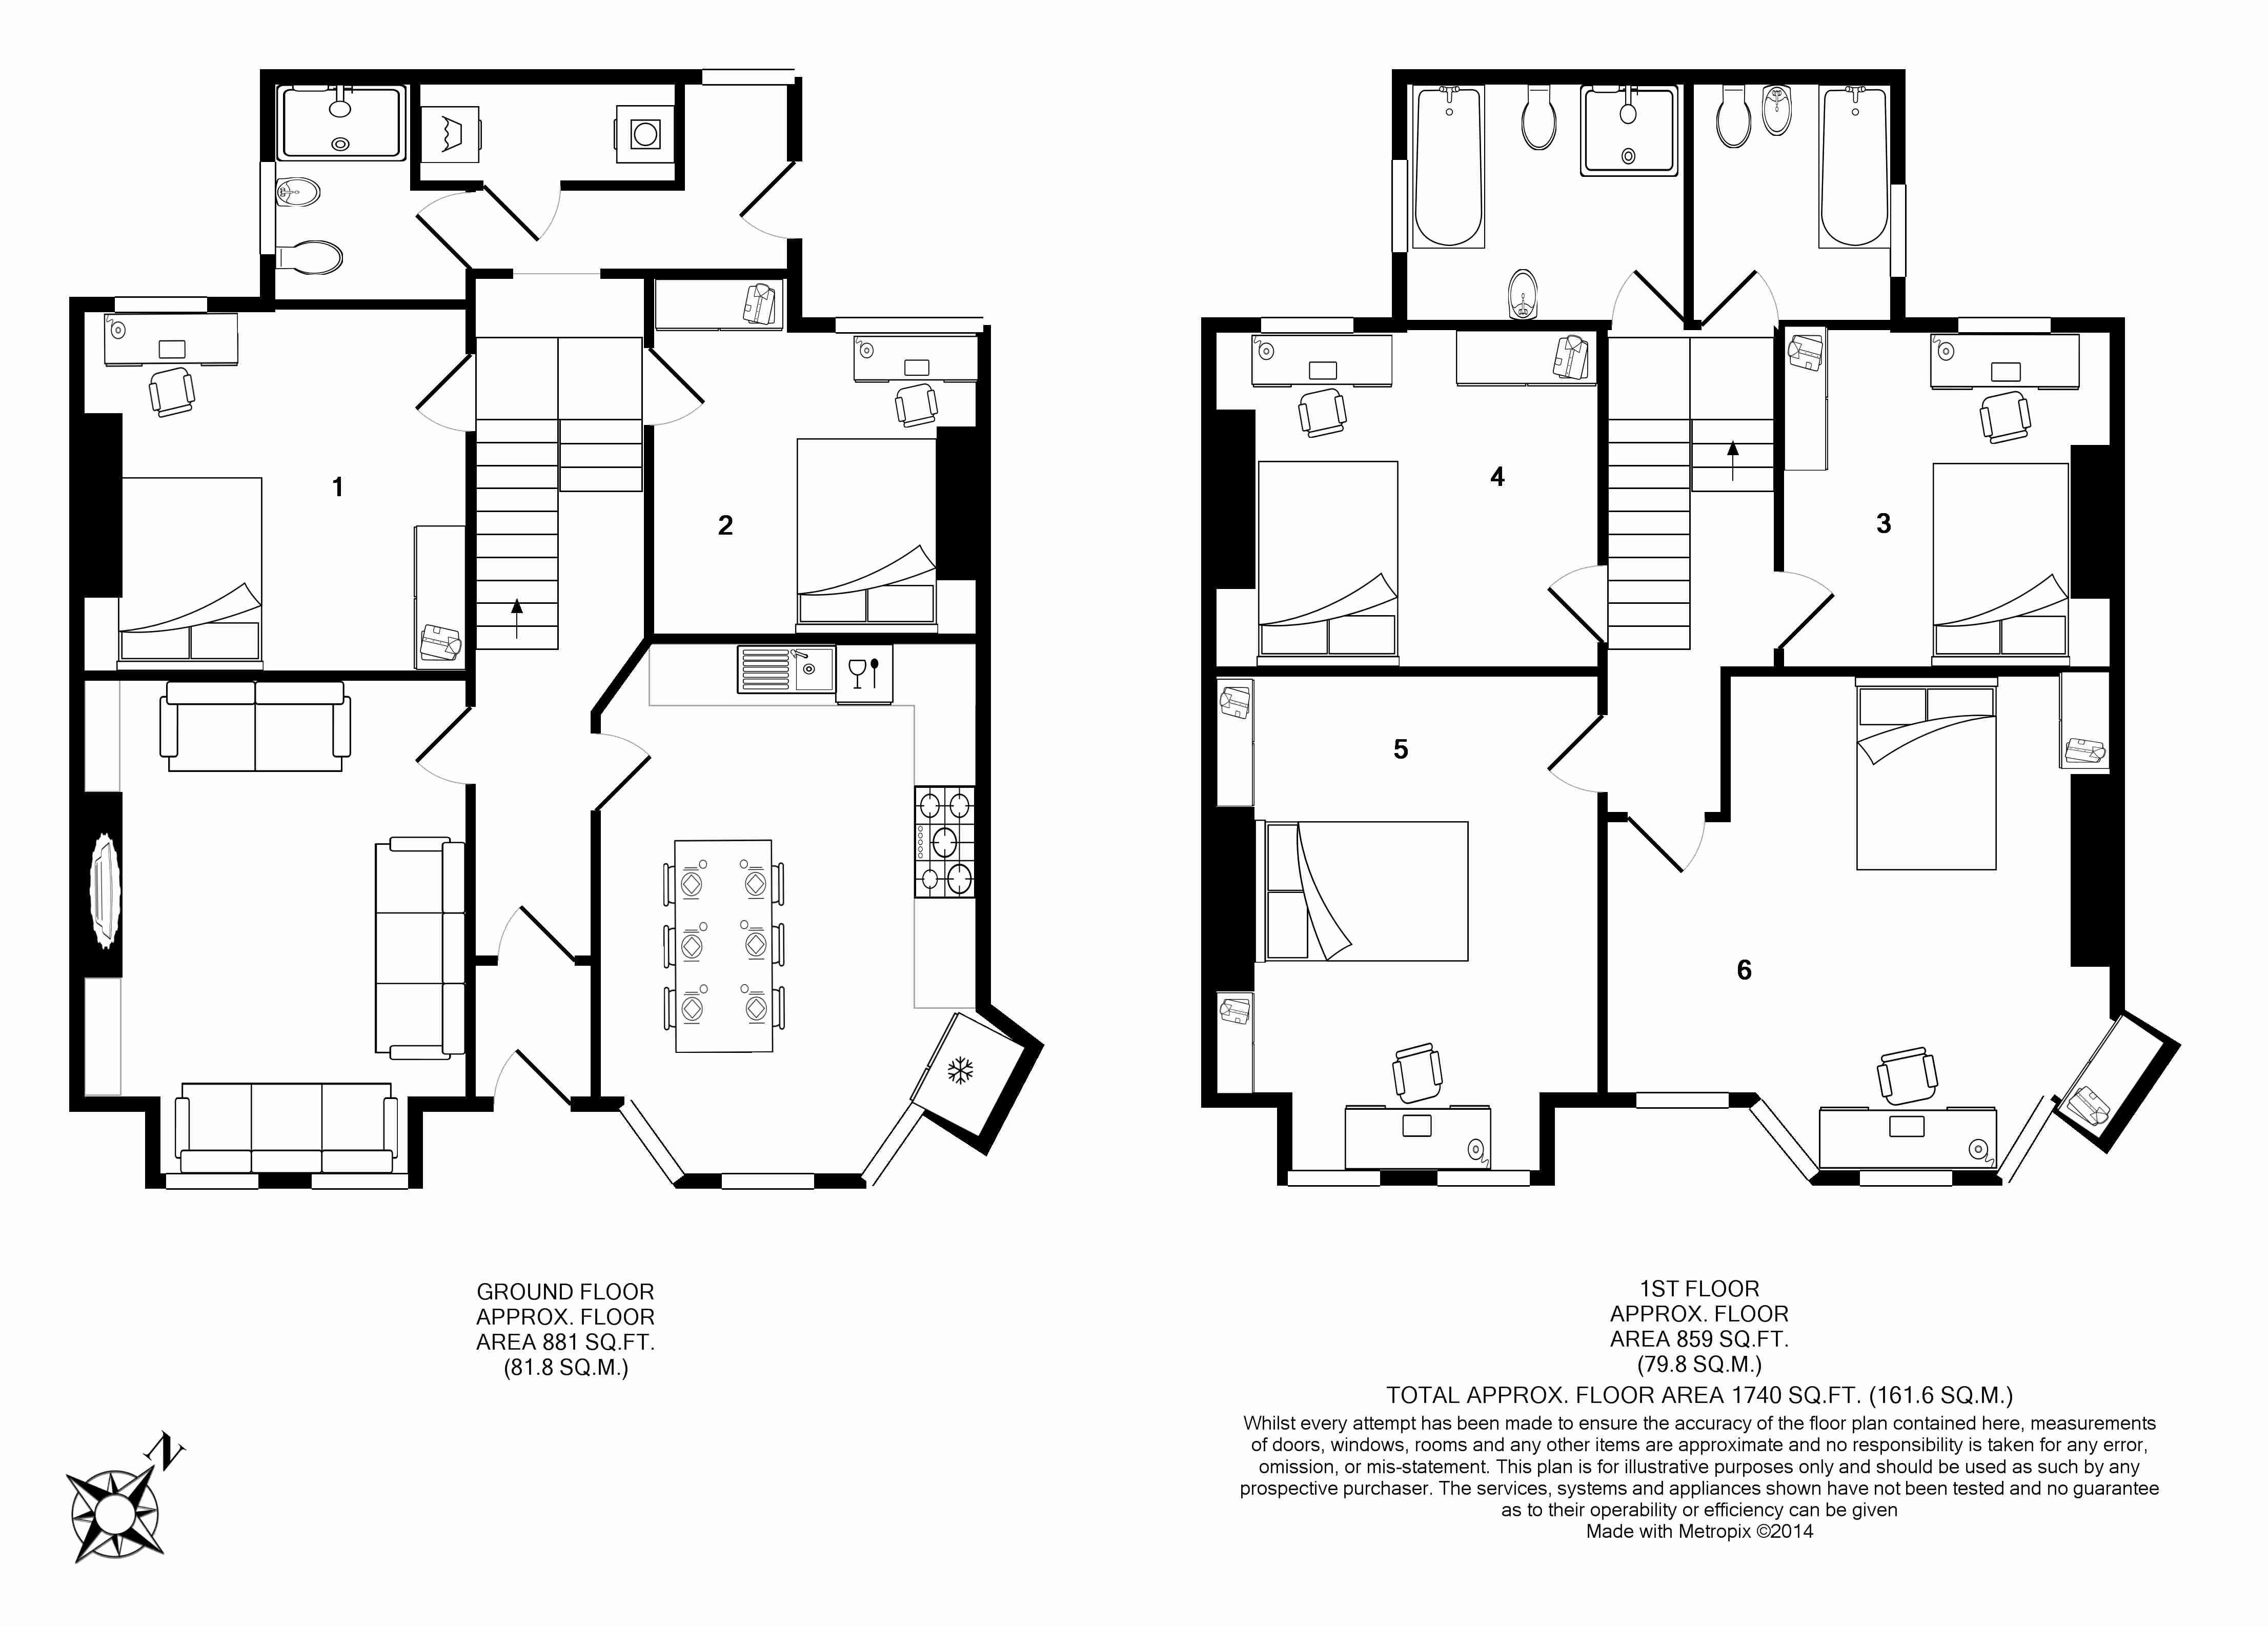 63 Borrowdale Road Floorplans